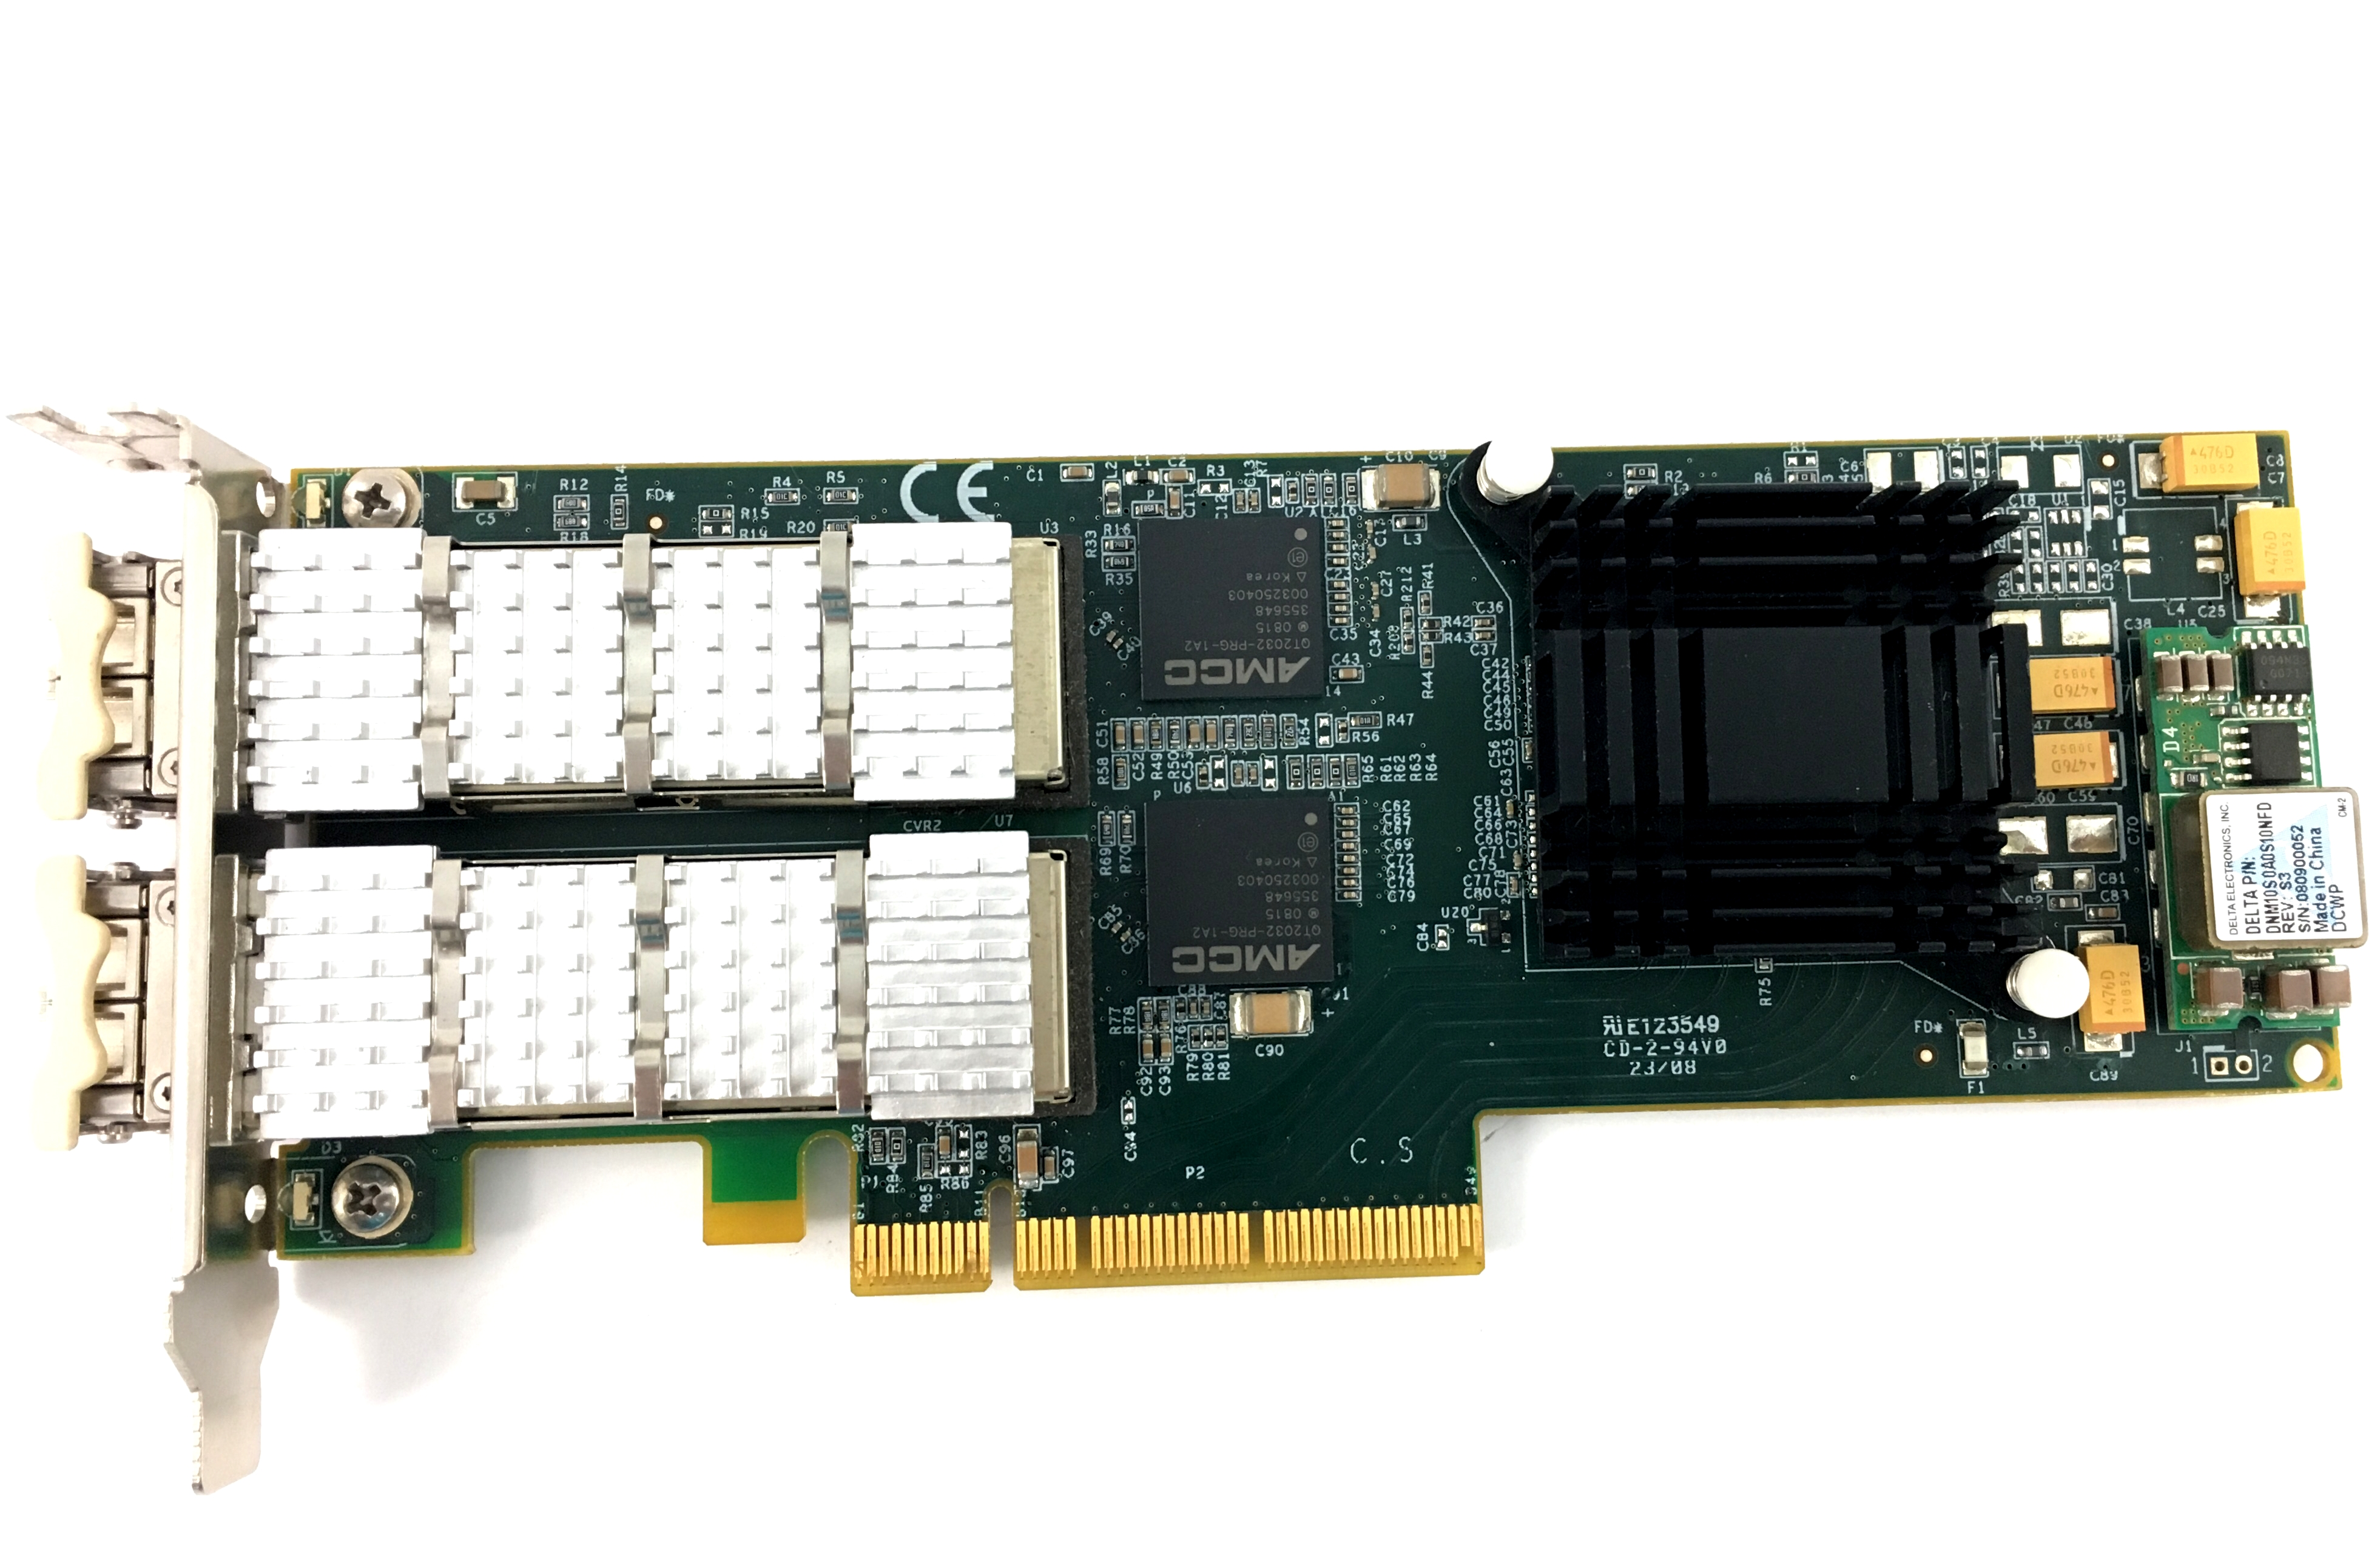 Sillicom Dual Port 10Gbe PCI-E Server Adapter (PE10G2I-SR)